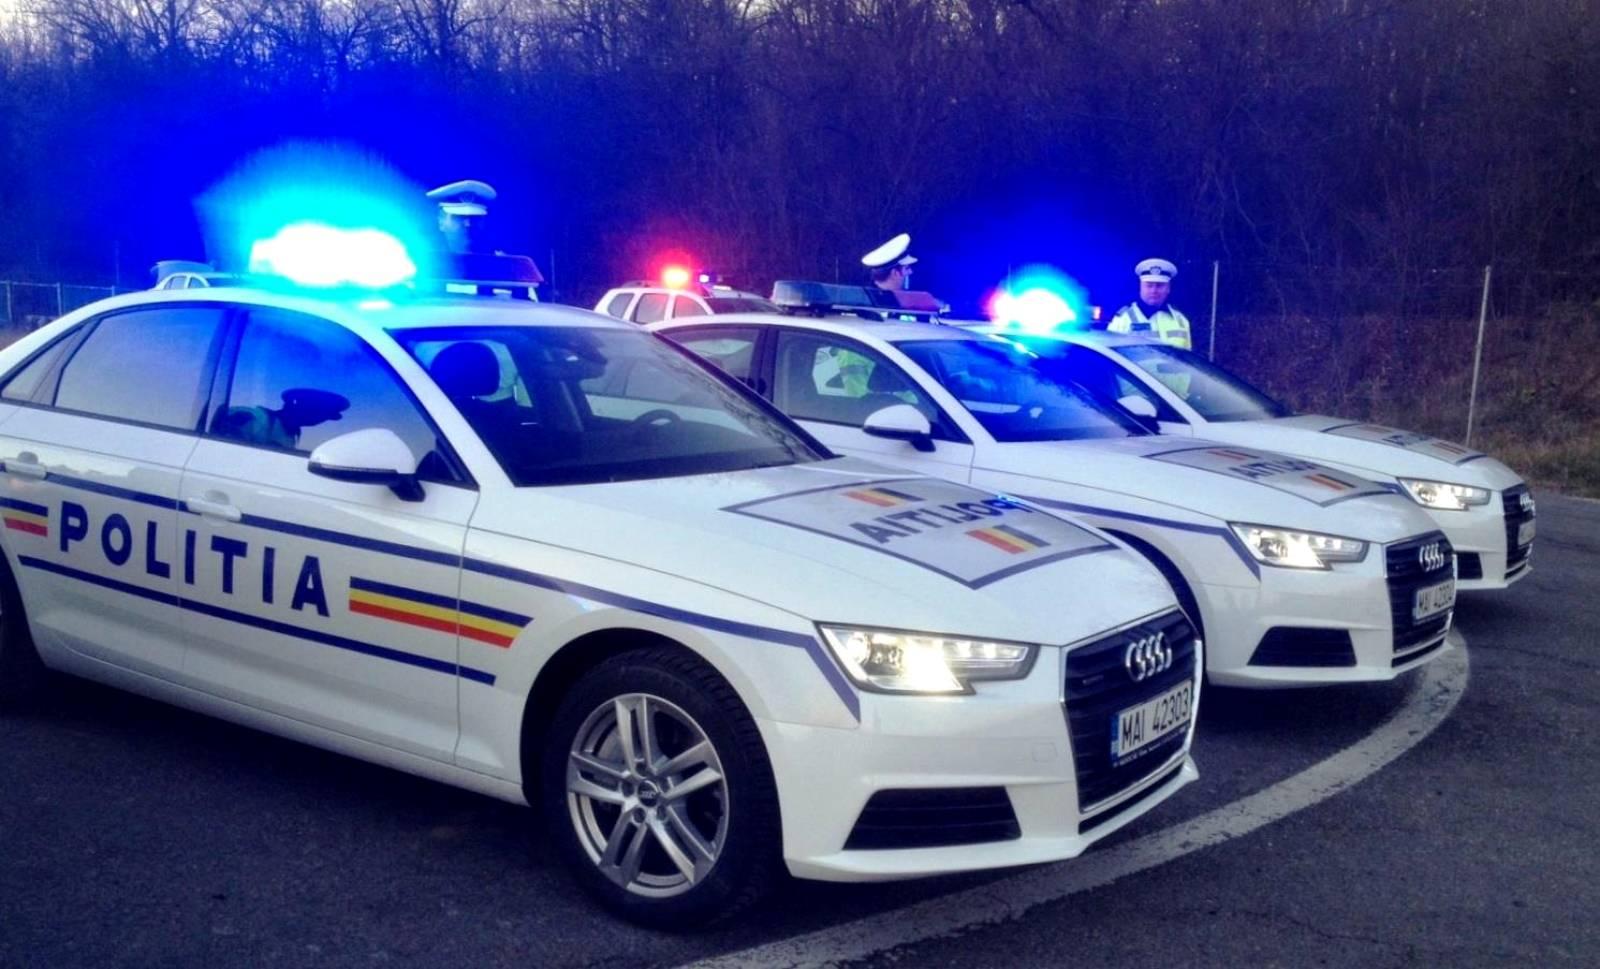 Politia Romana clarificari discutii interlopi